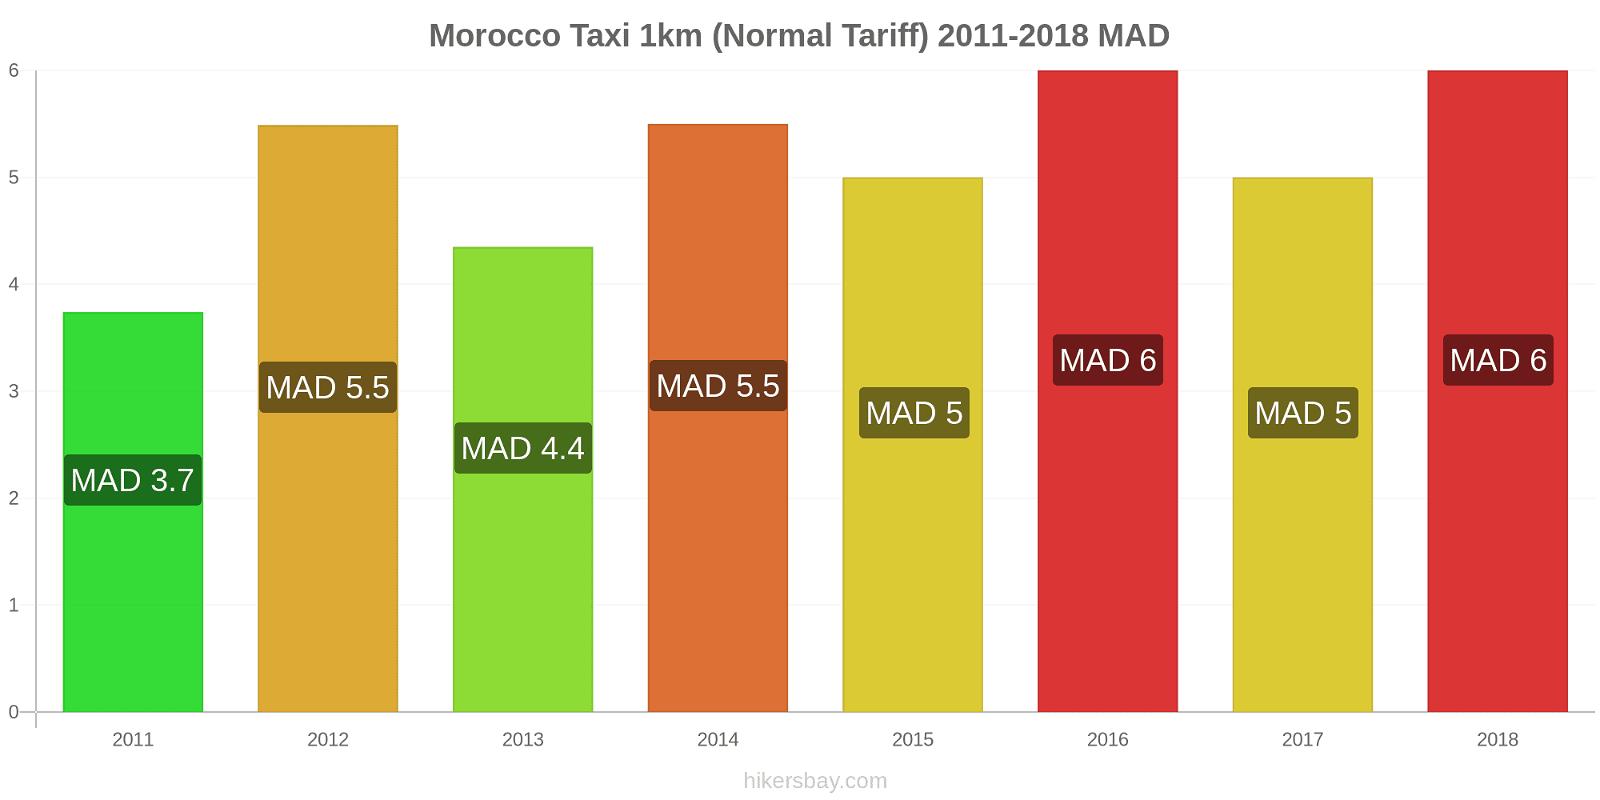 Morocco price changes Taxi 1km (Normal Tariff) hikersbay.com